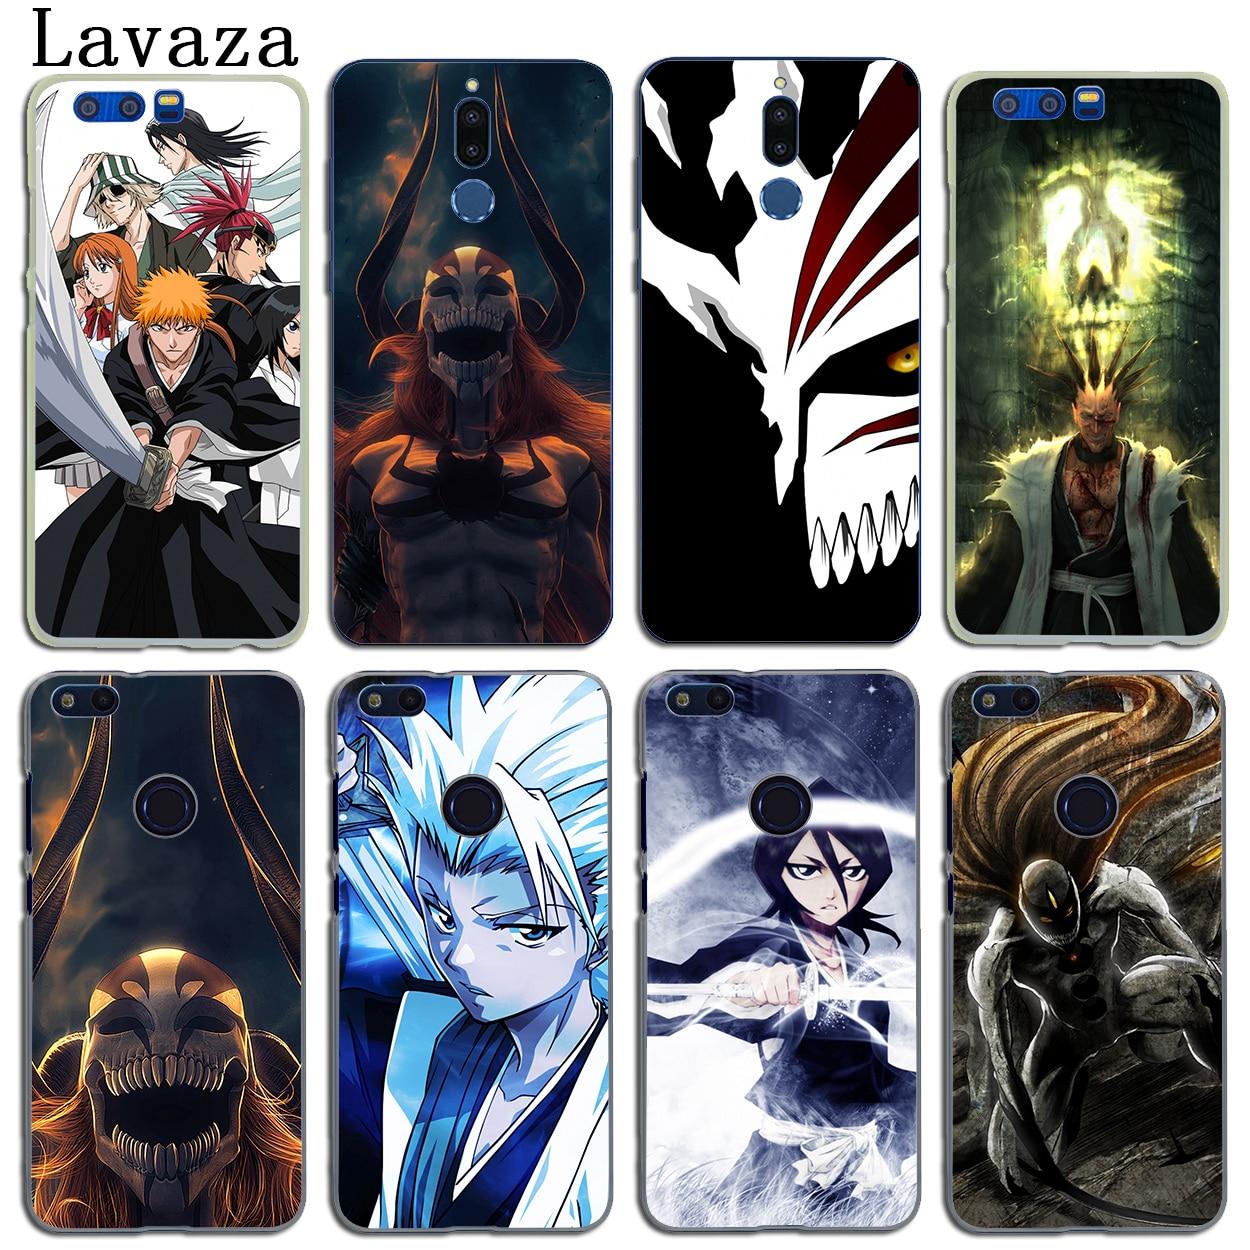 Japanese Anime Bleach Case For Huawei Y6 Y7 Prime Y5 Y9